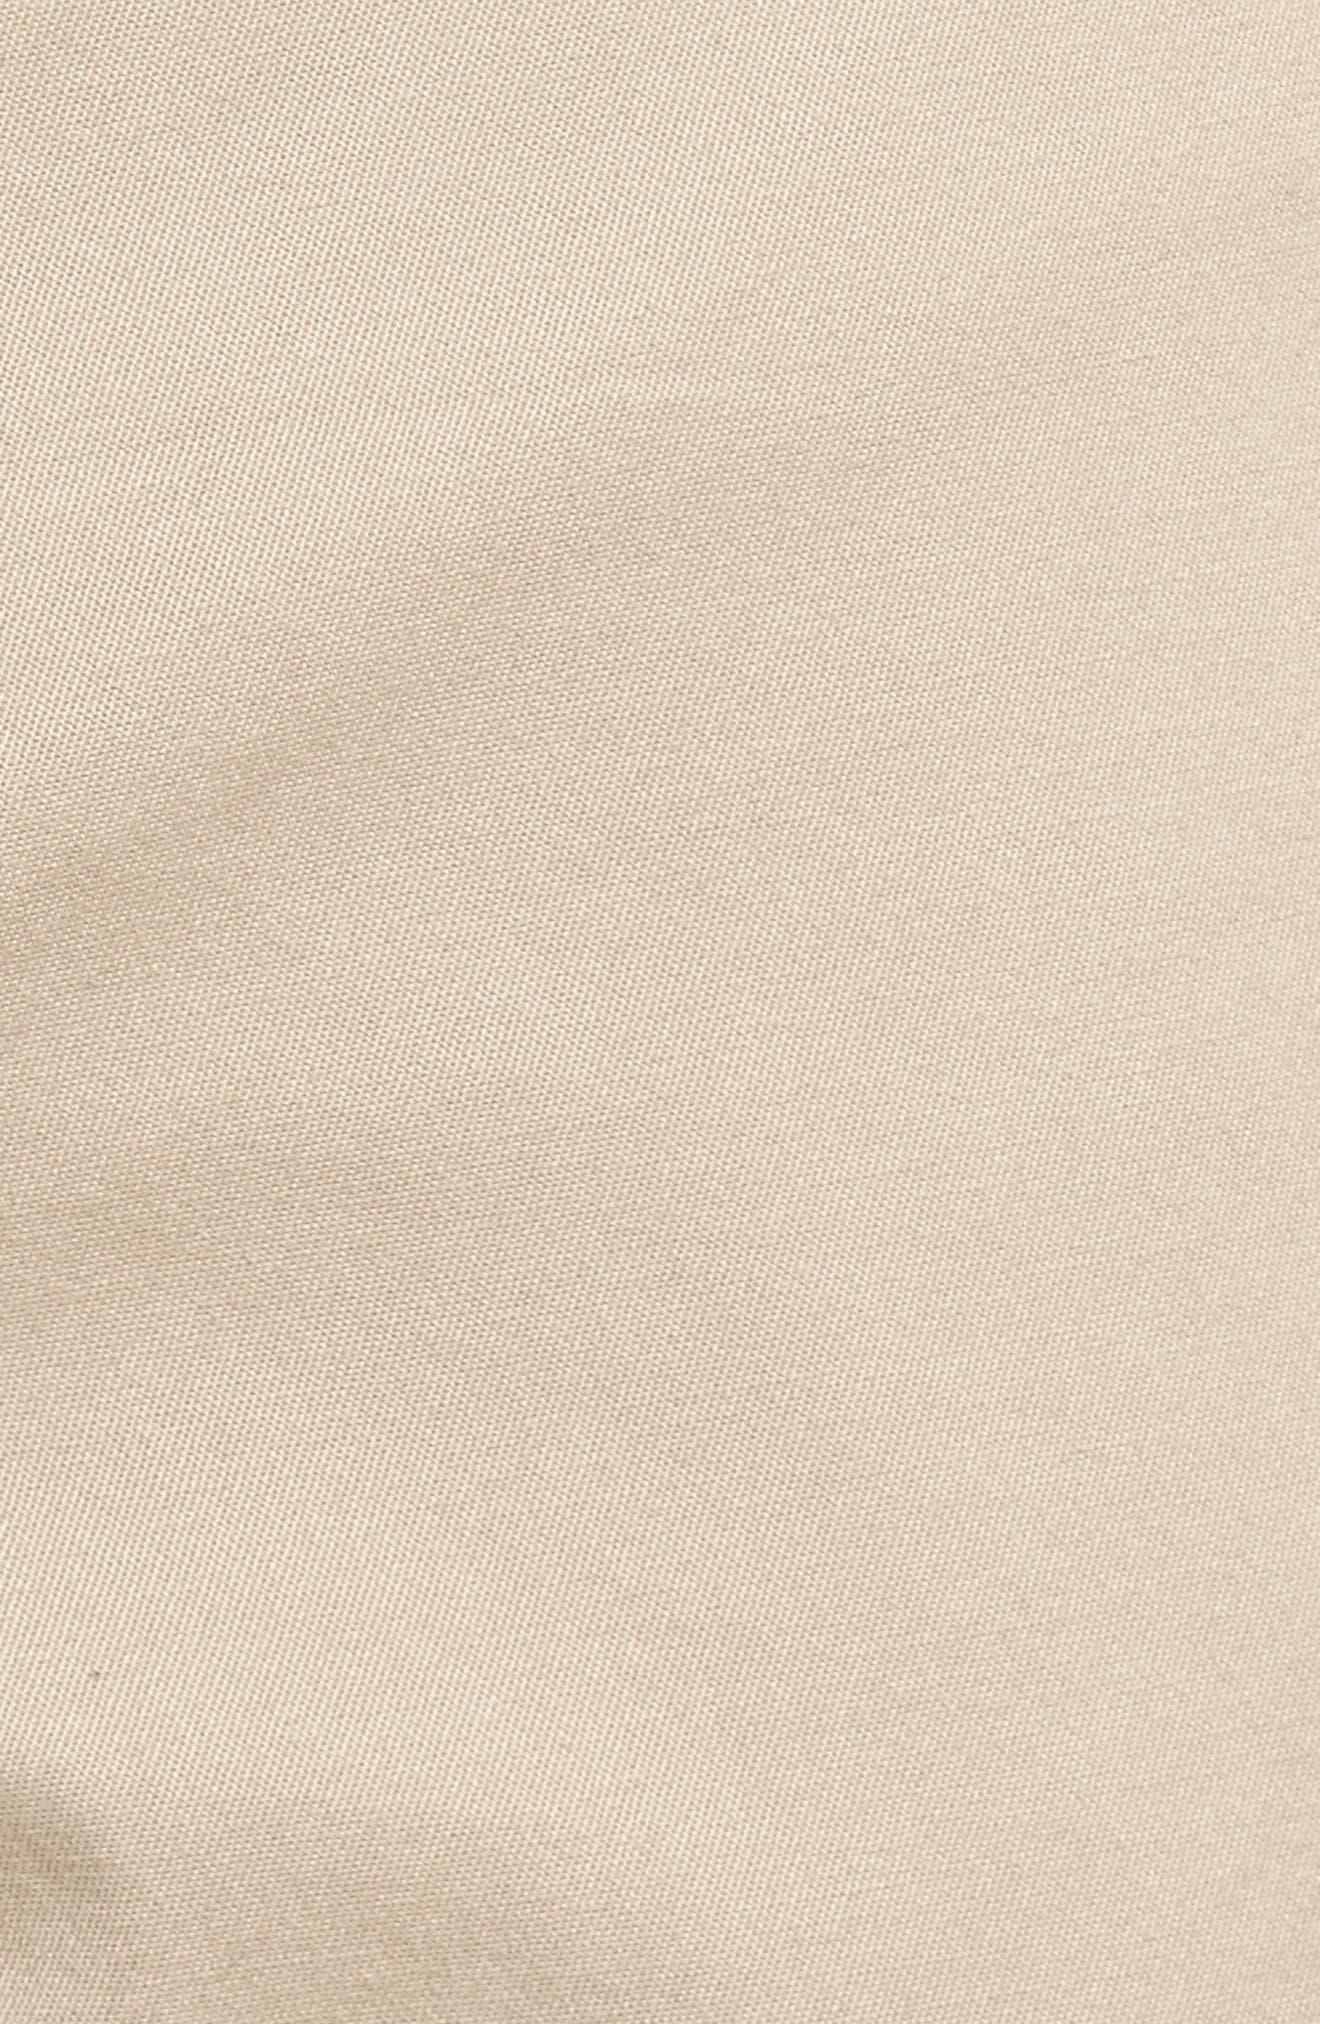 9 Inch Stretch Breaker Shorts,                             Alternate thumbnail 5, color,                             Khaki